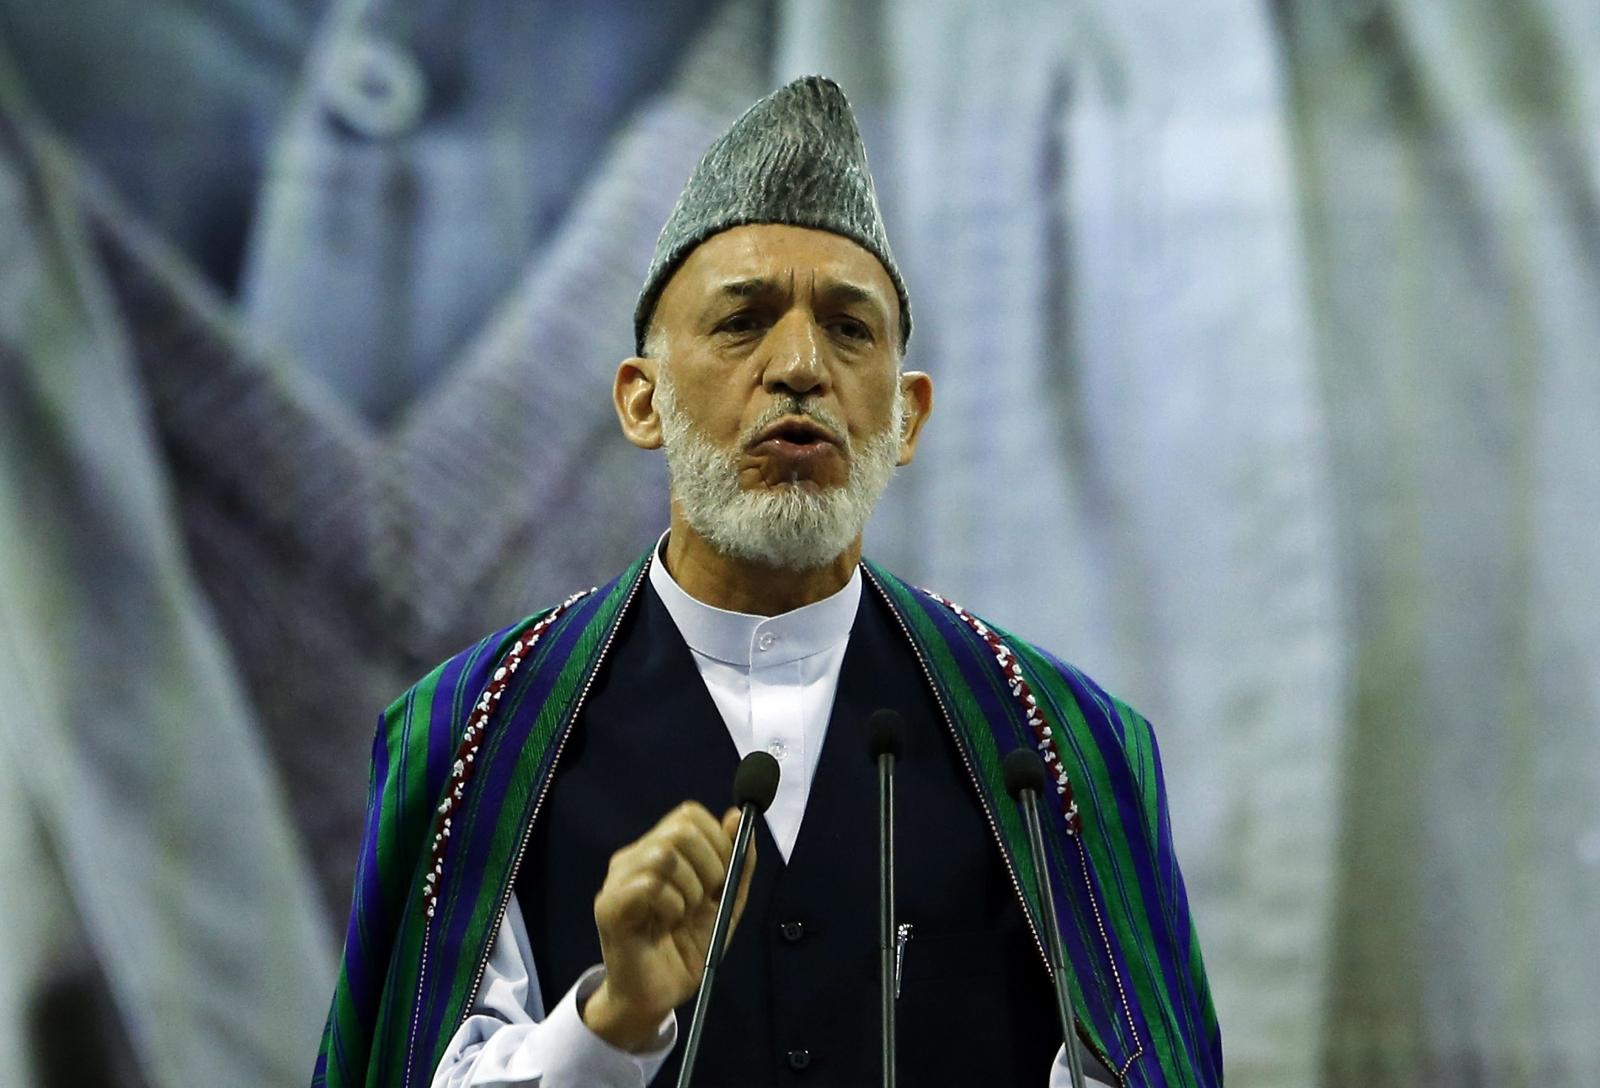 Hamid Karzai and the US